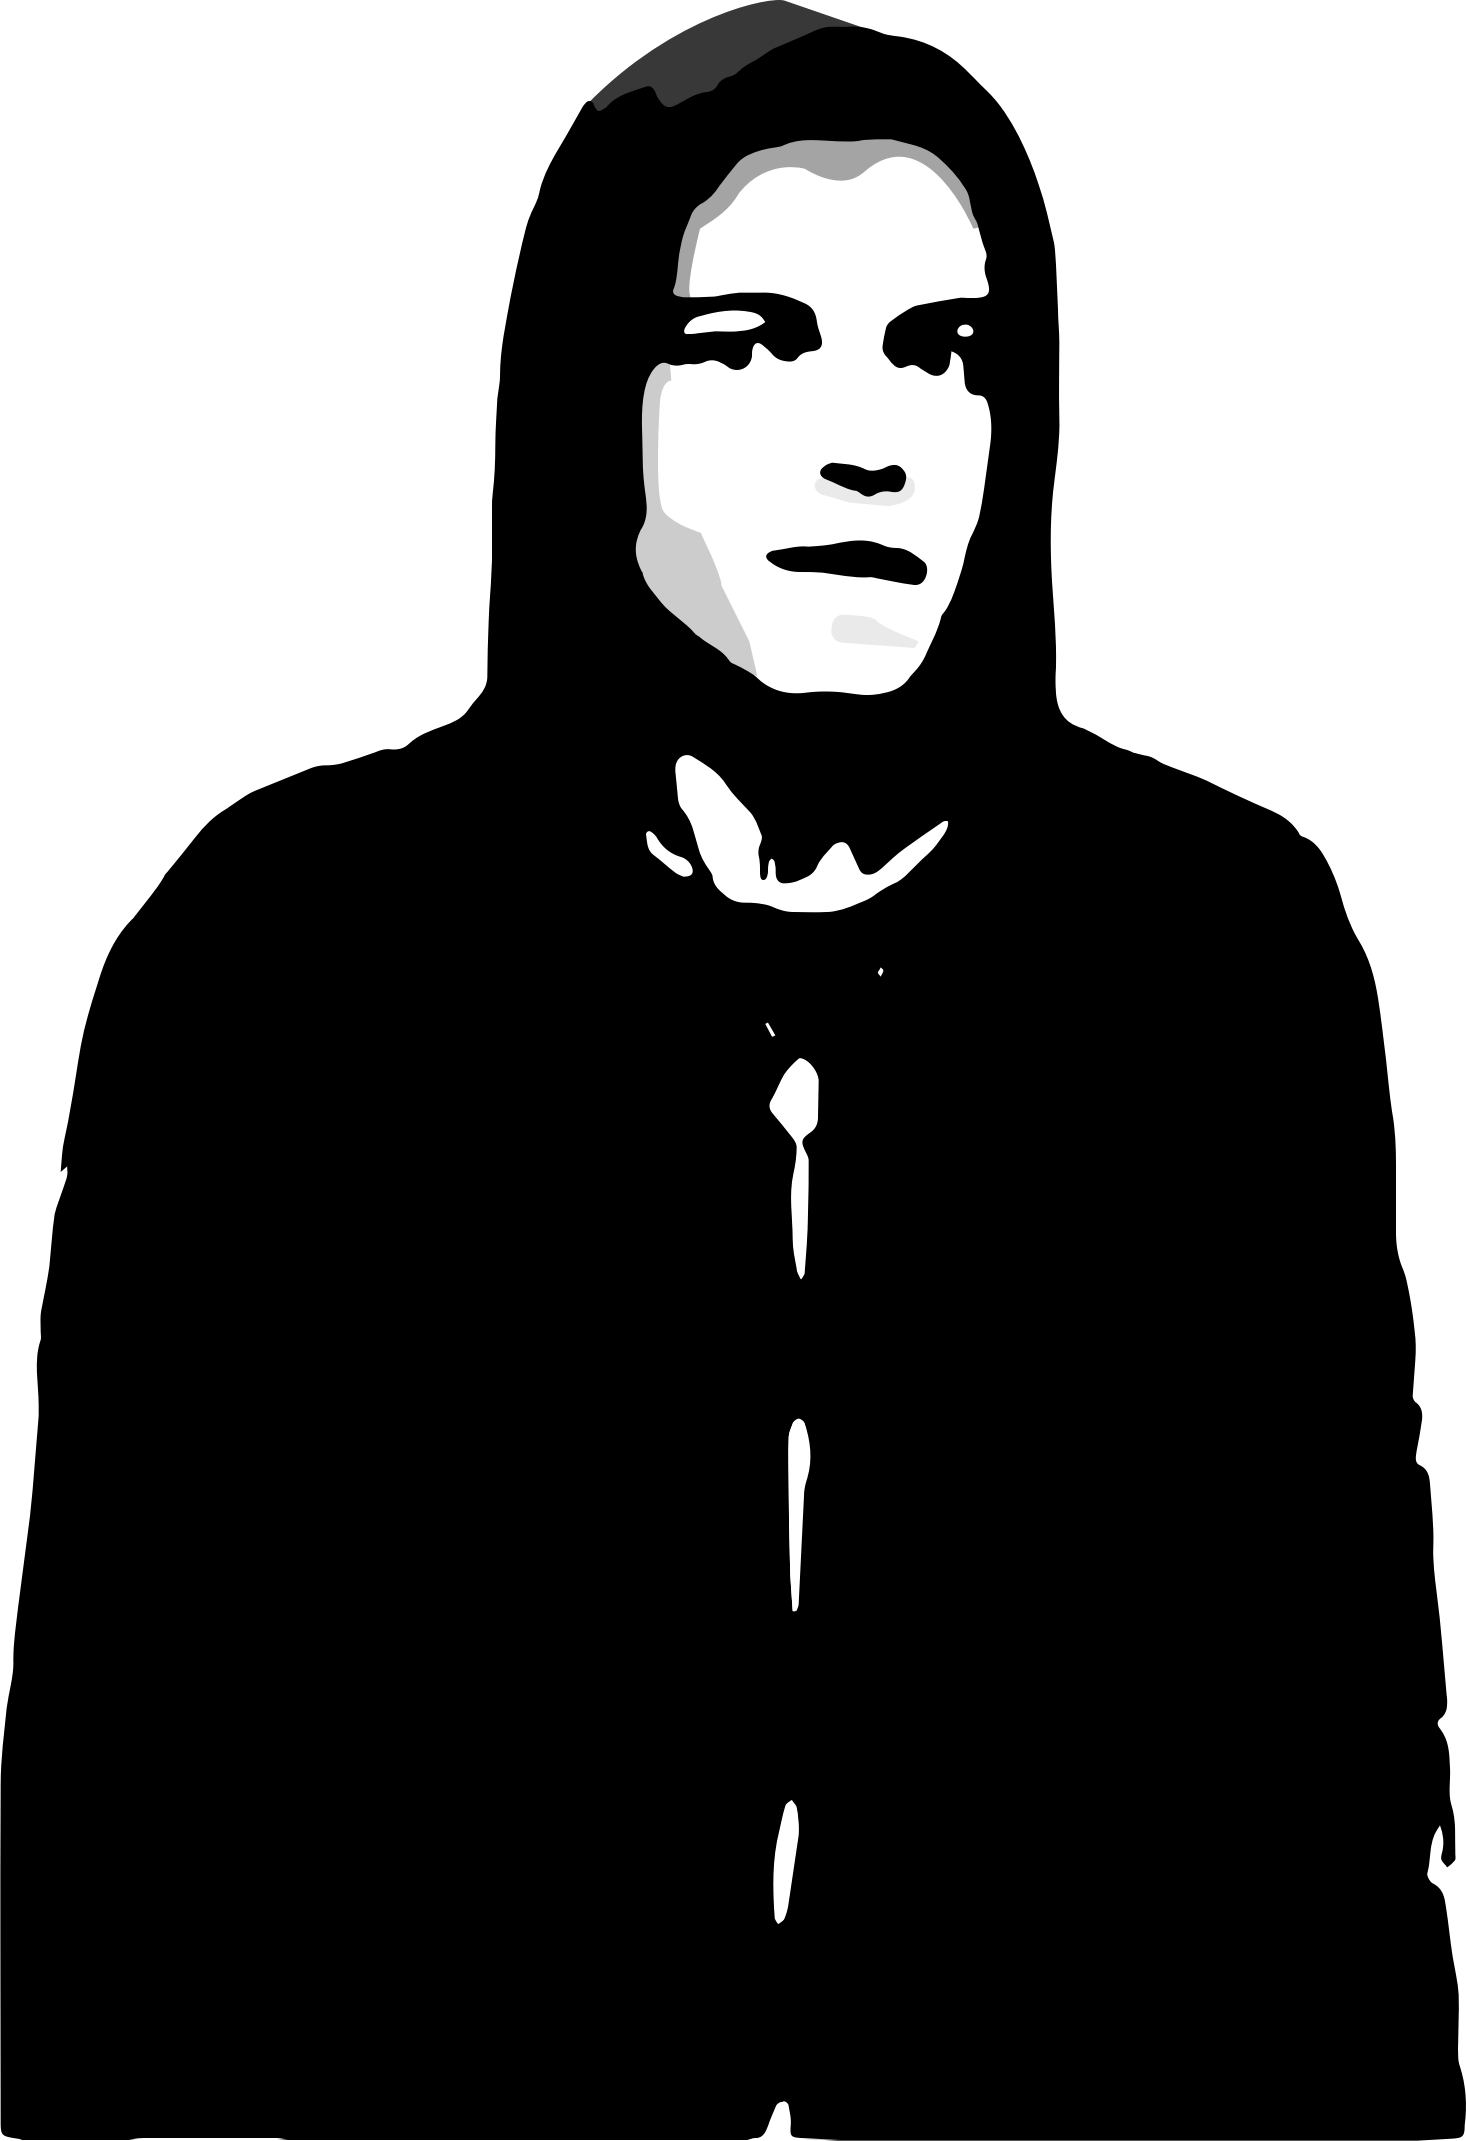 Elliot alderson clipart clipart black and white stock Mr. Robot Elliot Alderson Portable Network Graphics Clip art Image ... clipart black and white stock